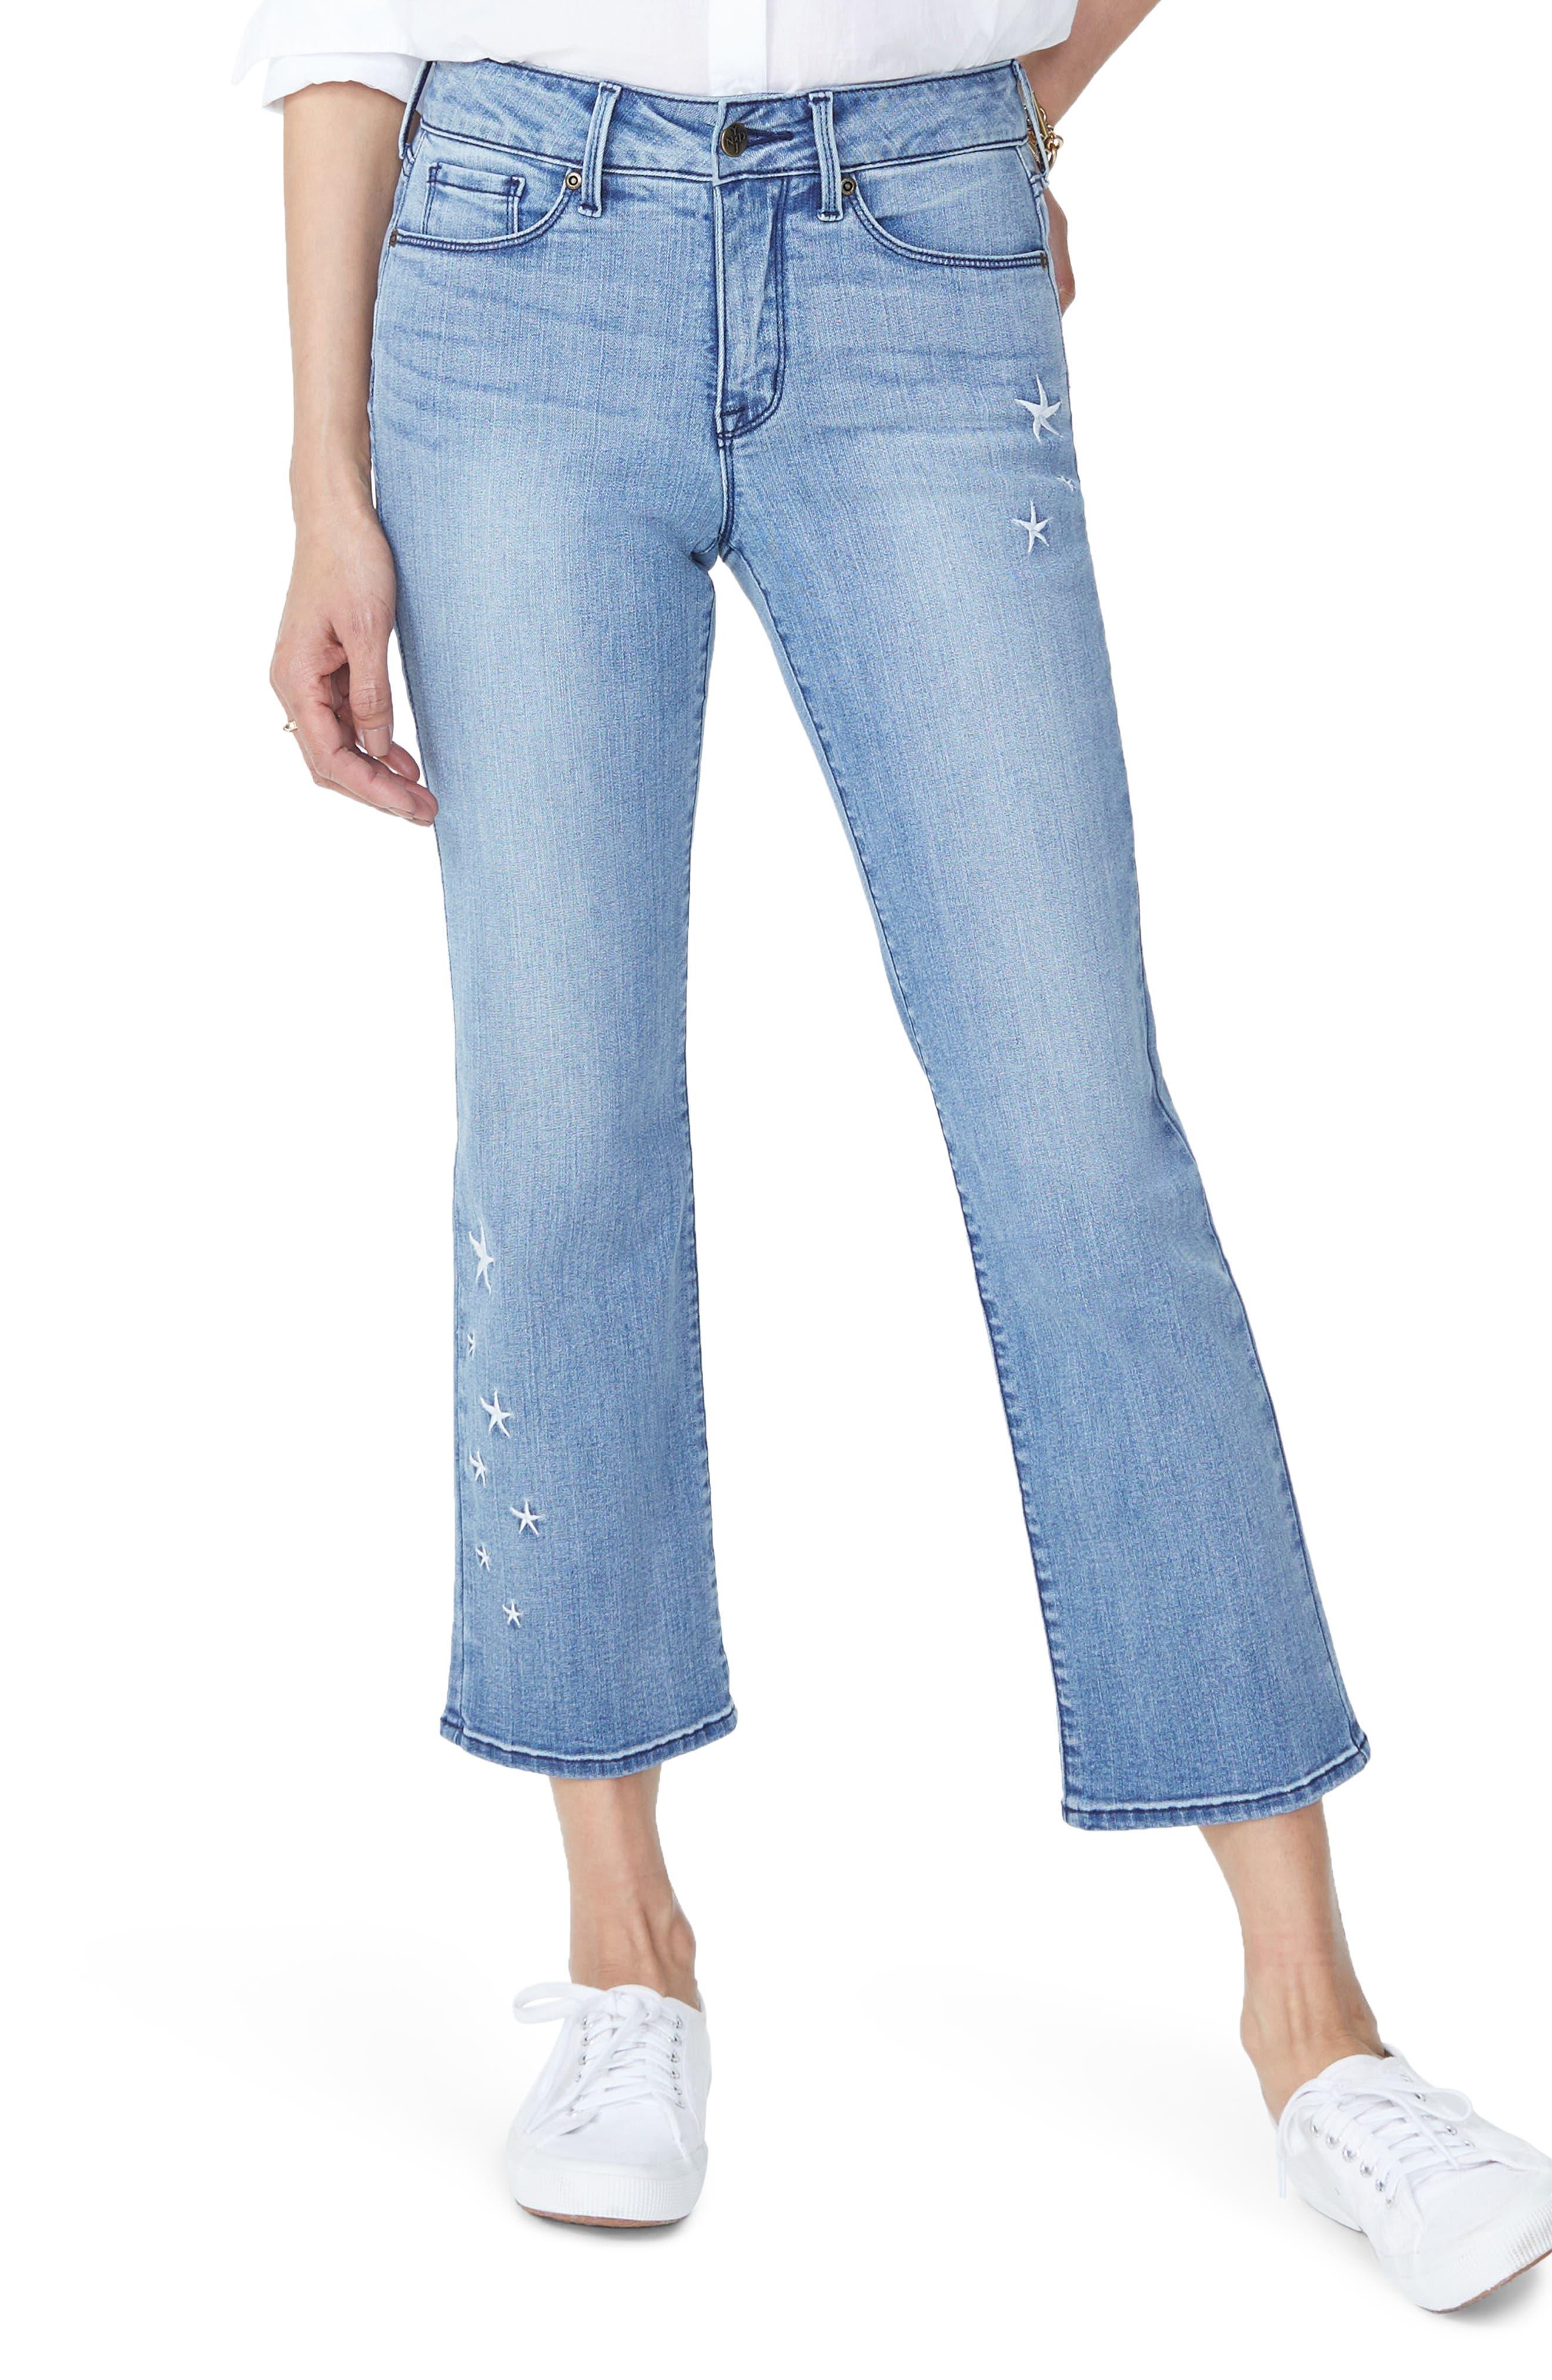 Marilyn High Waist Straight Leg Star Ankle Jeans,                             Main thumbnail 1, color,                             POINT DUME